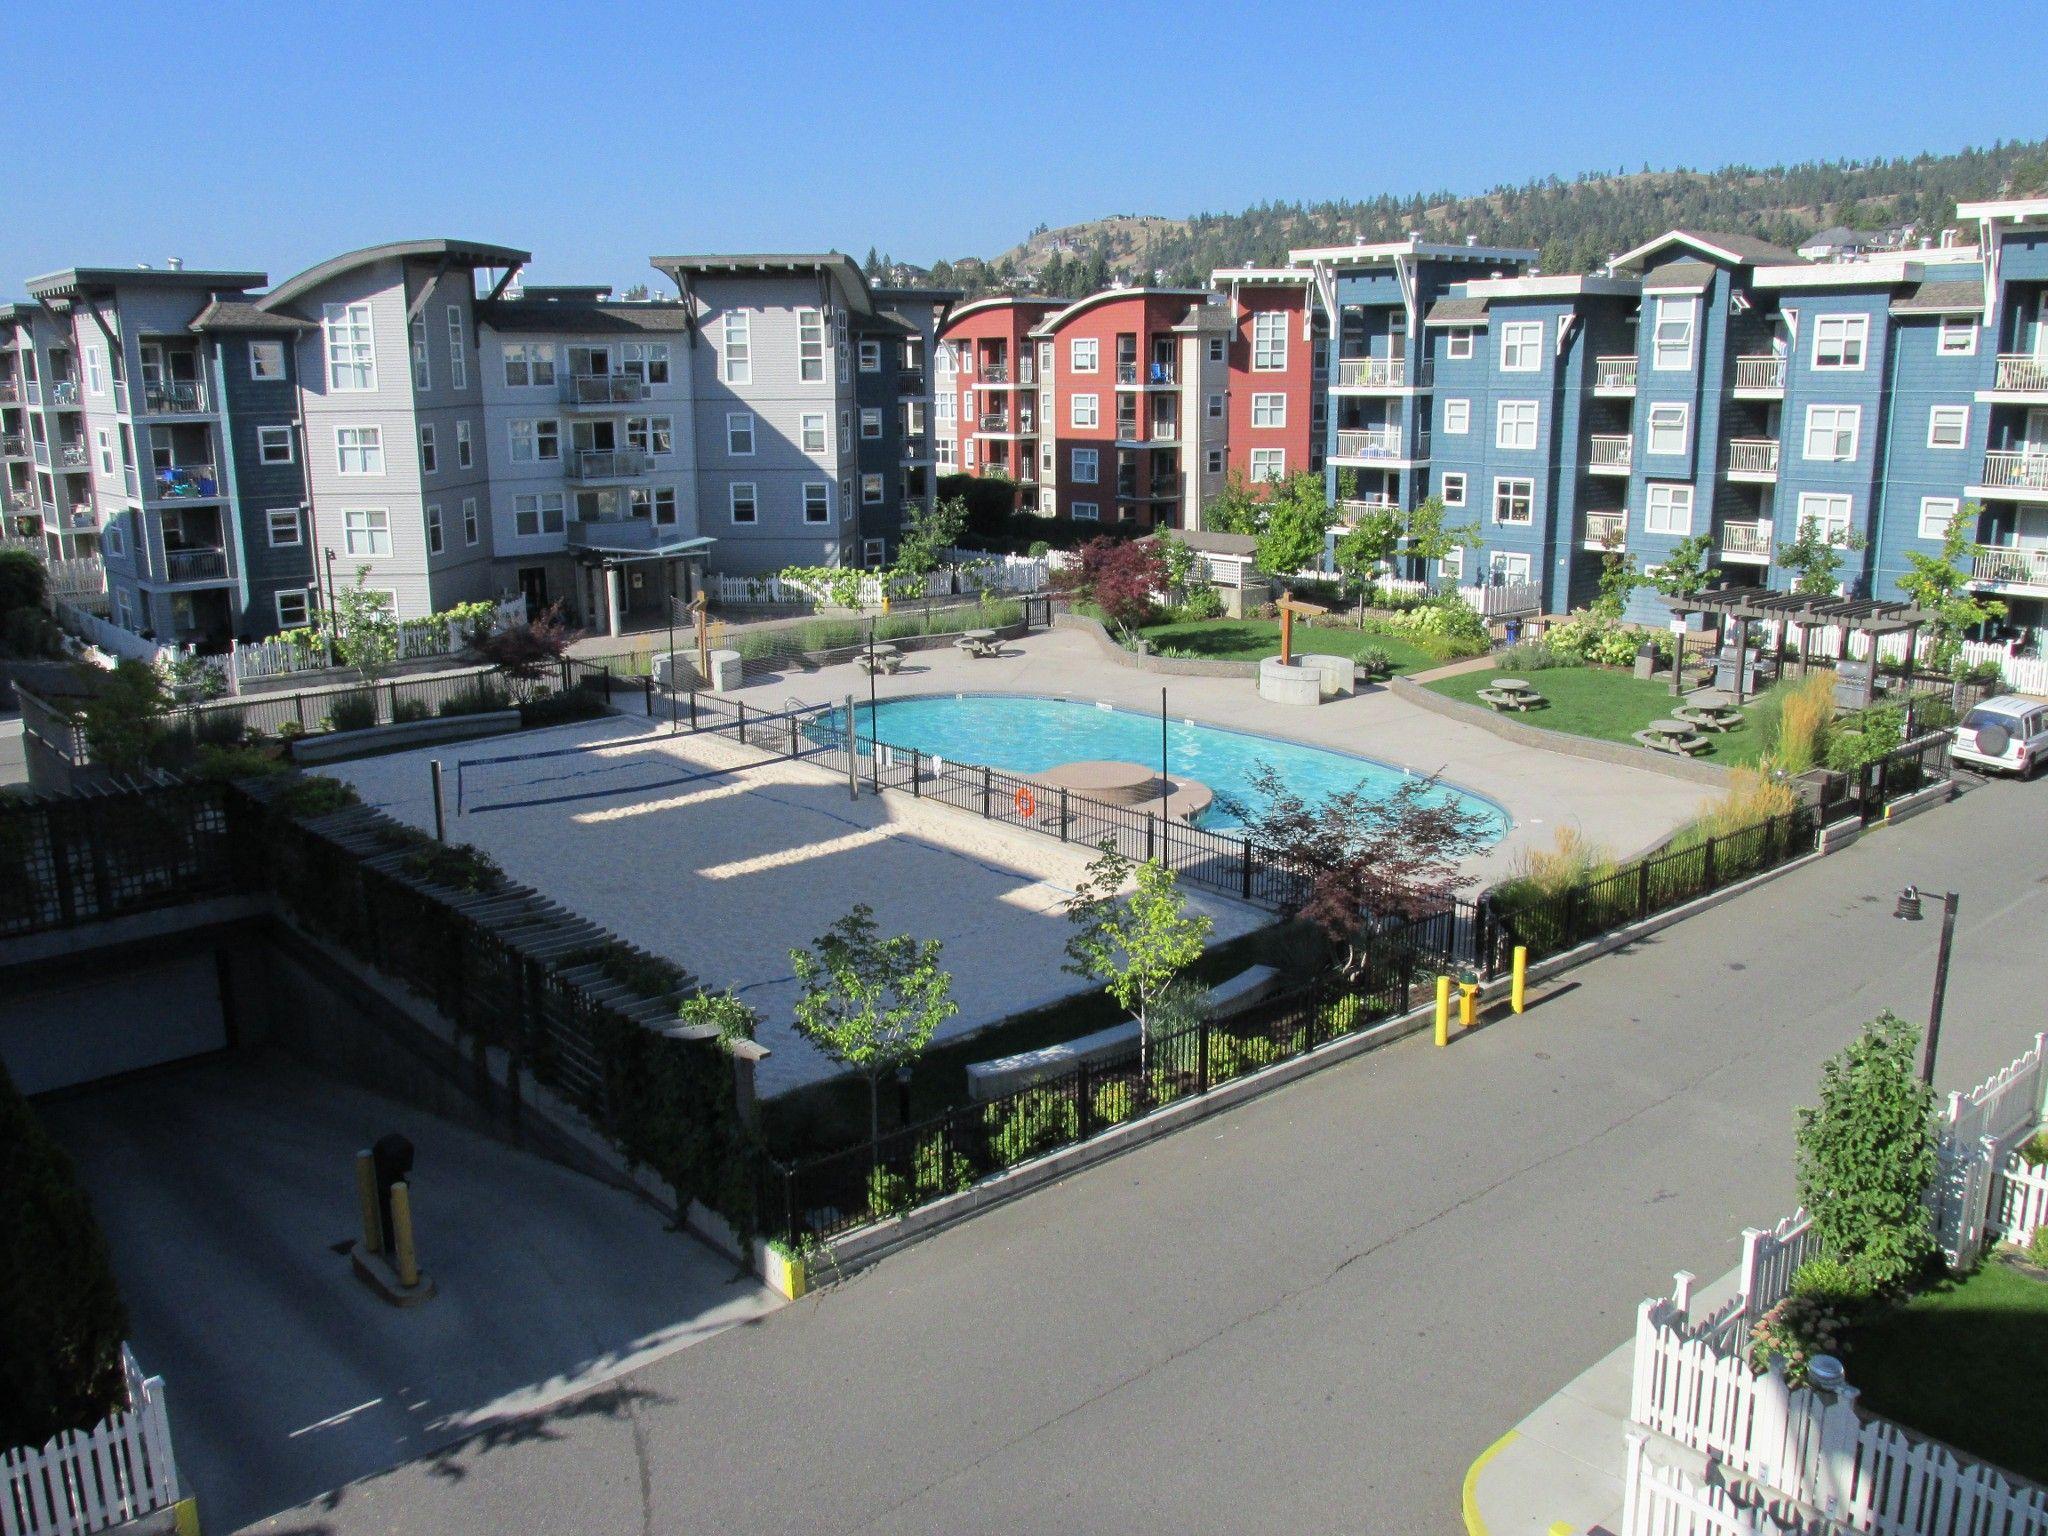 Main Photo: 216-533 Yates Rd in Kelowna: North Glenmore Condo for sale : MLS®# 10179269